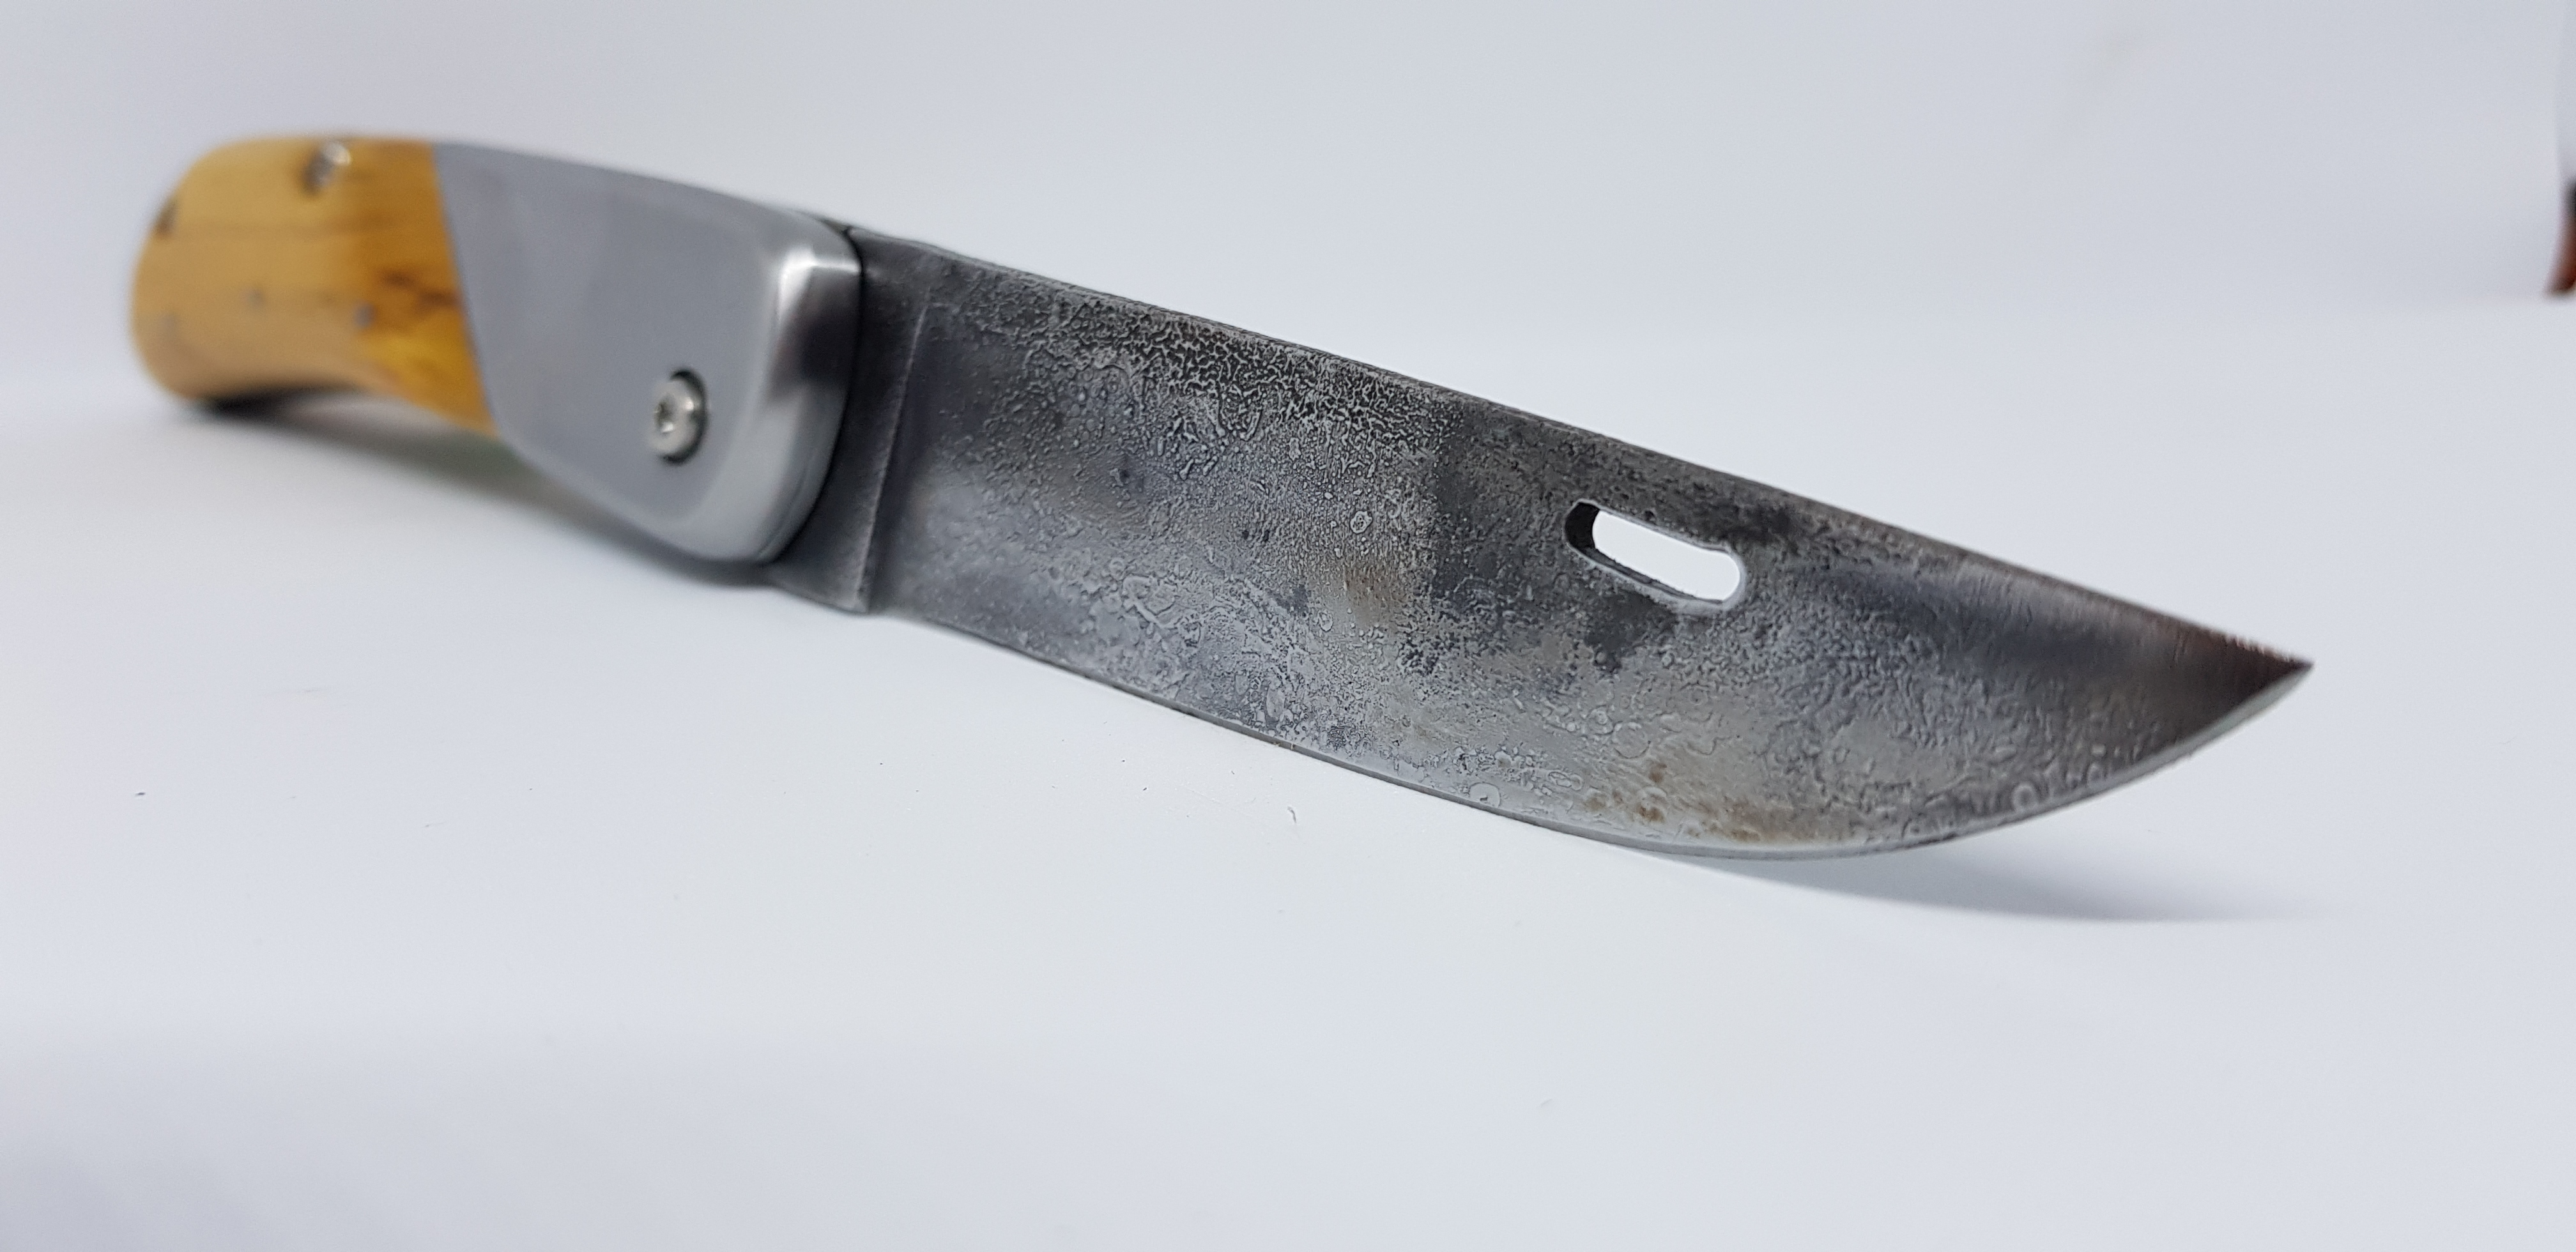 Couteau pliant onglet ouvert